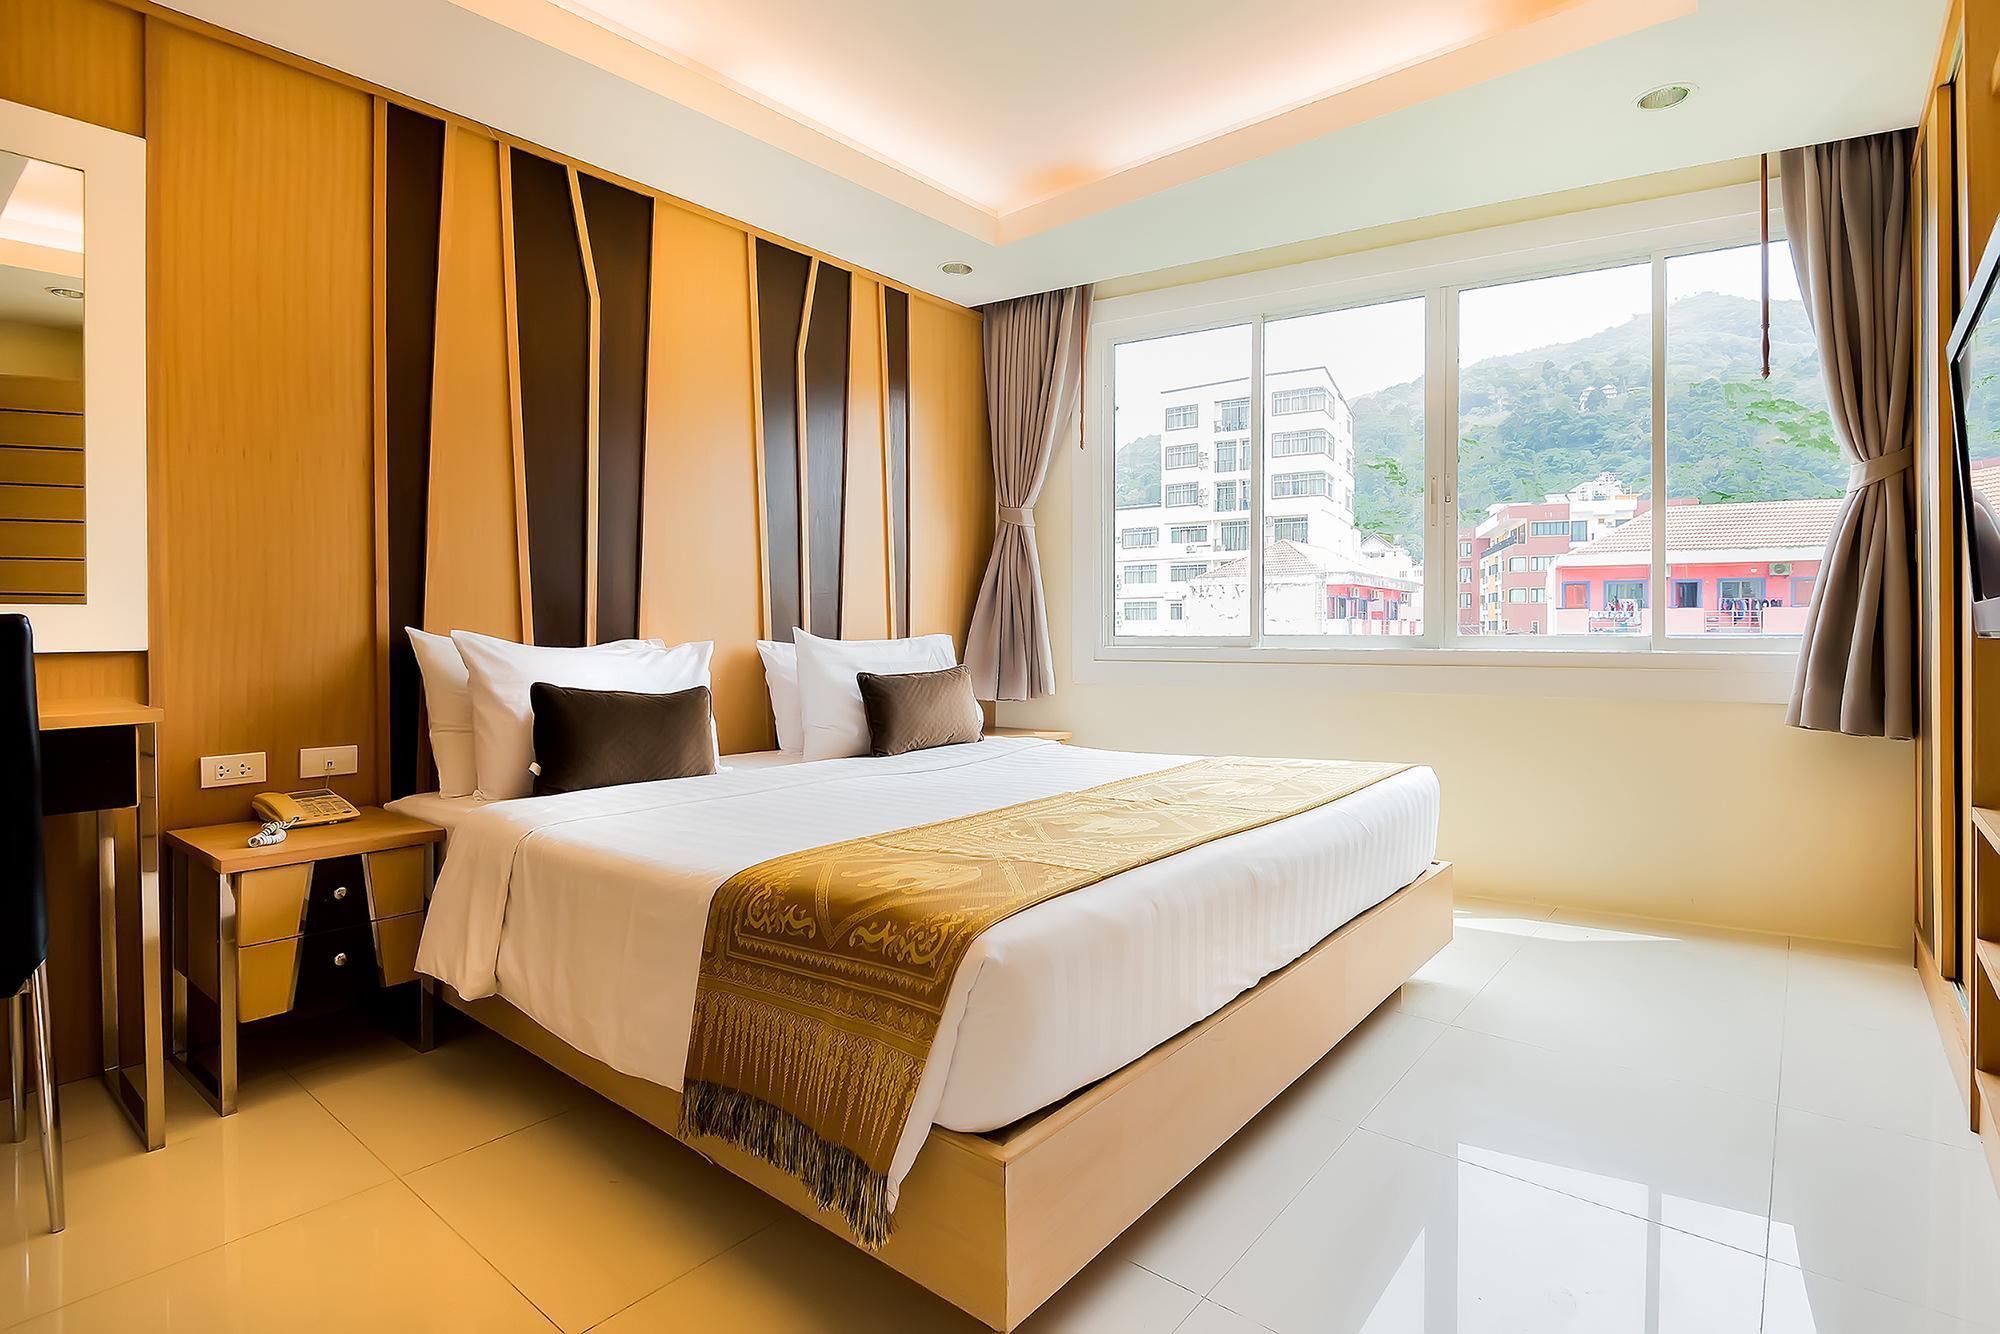 The Allano Phuket Hotel ดิ อัลลาโน ภูเก็ต โฮเต็ล